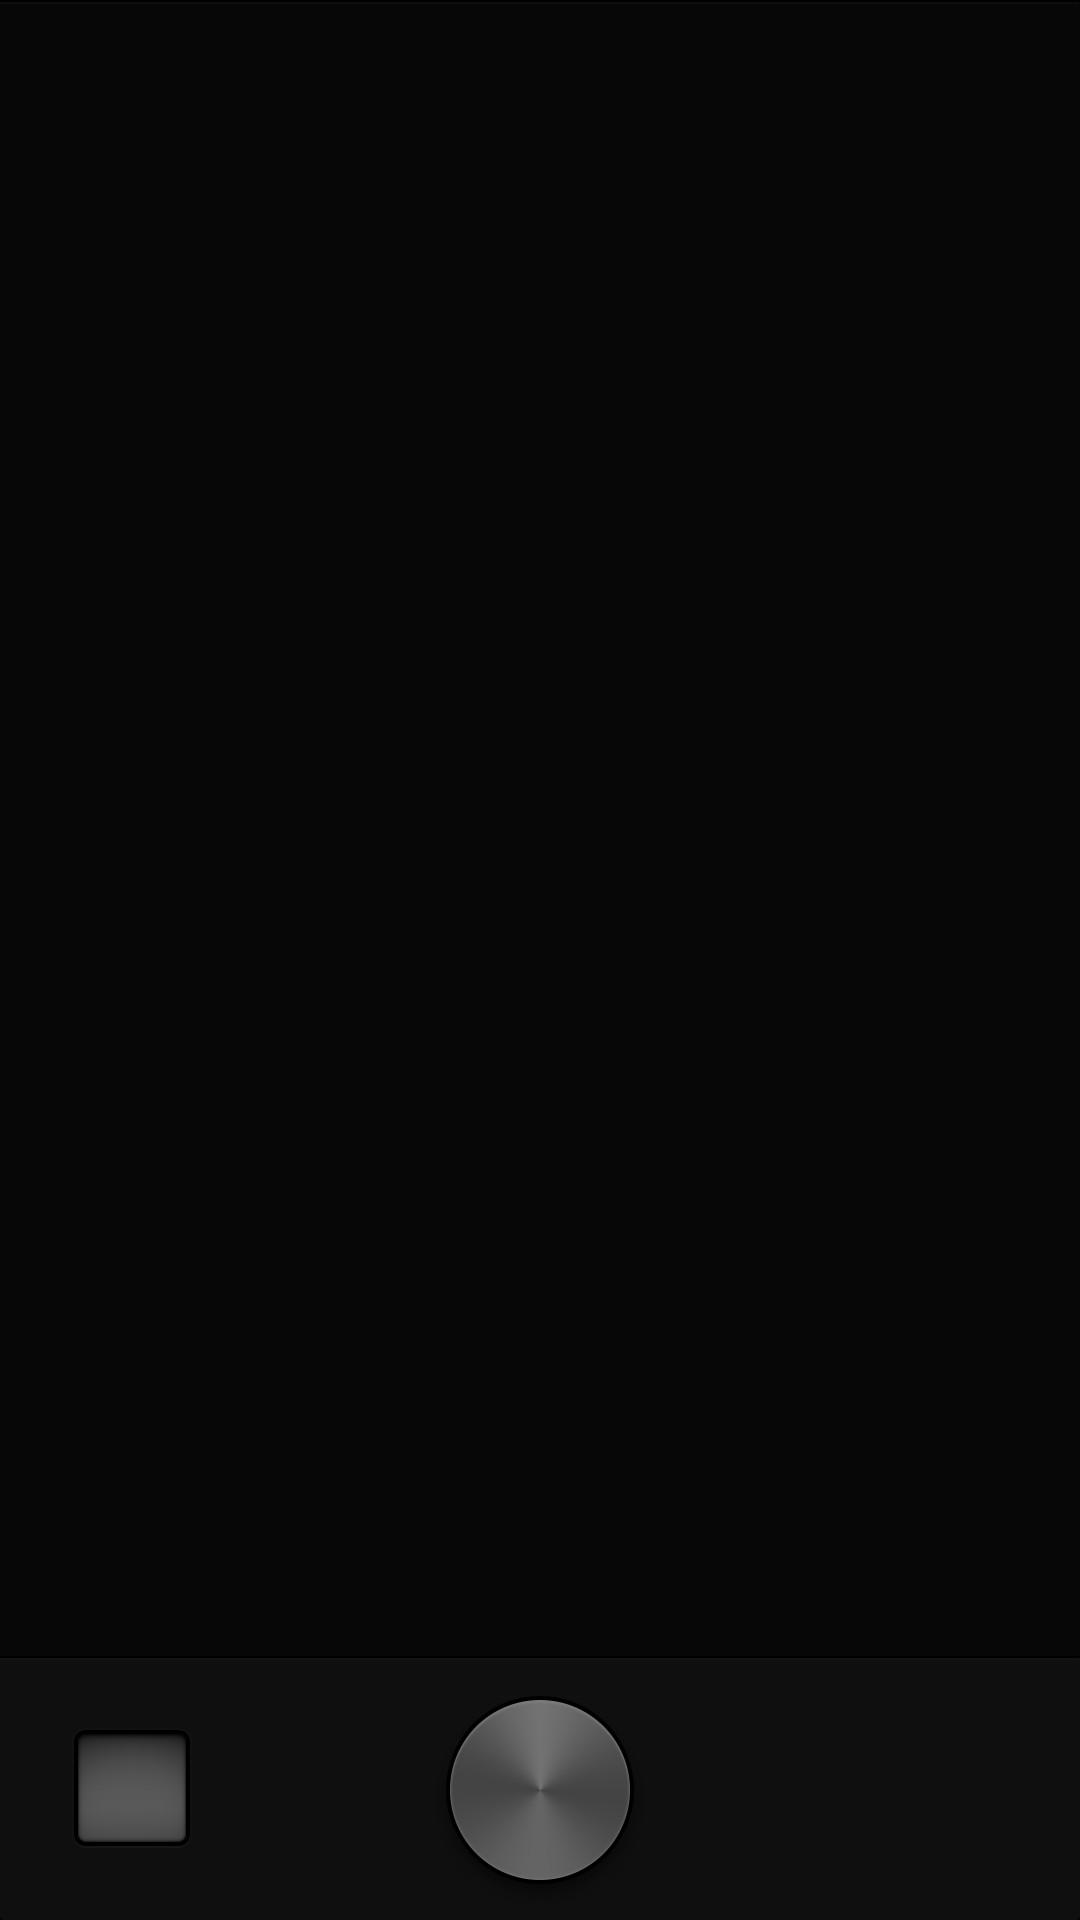 Screenshot_2018-07-12-18-23-55-339_??.png